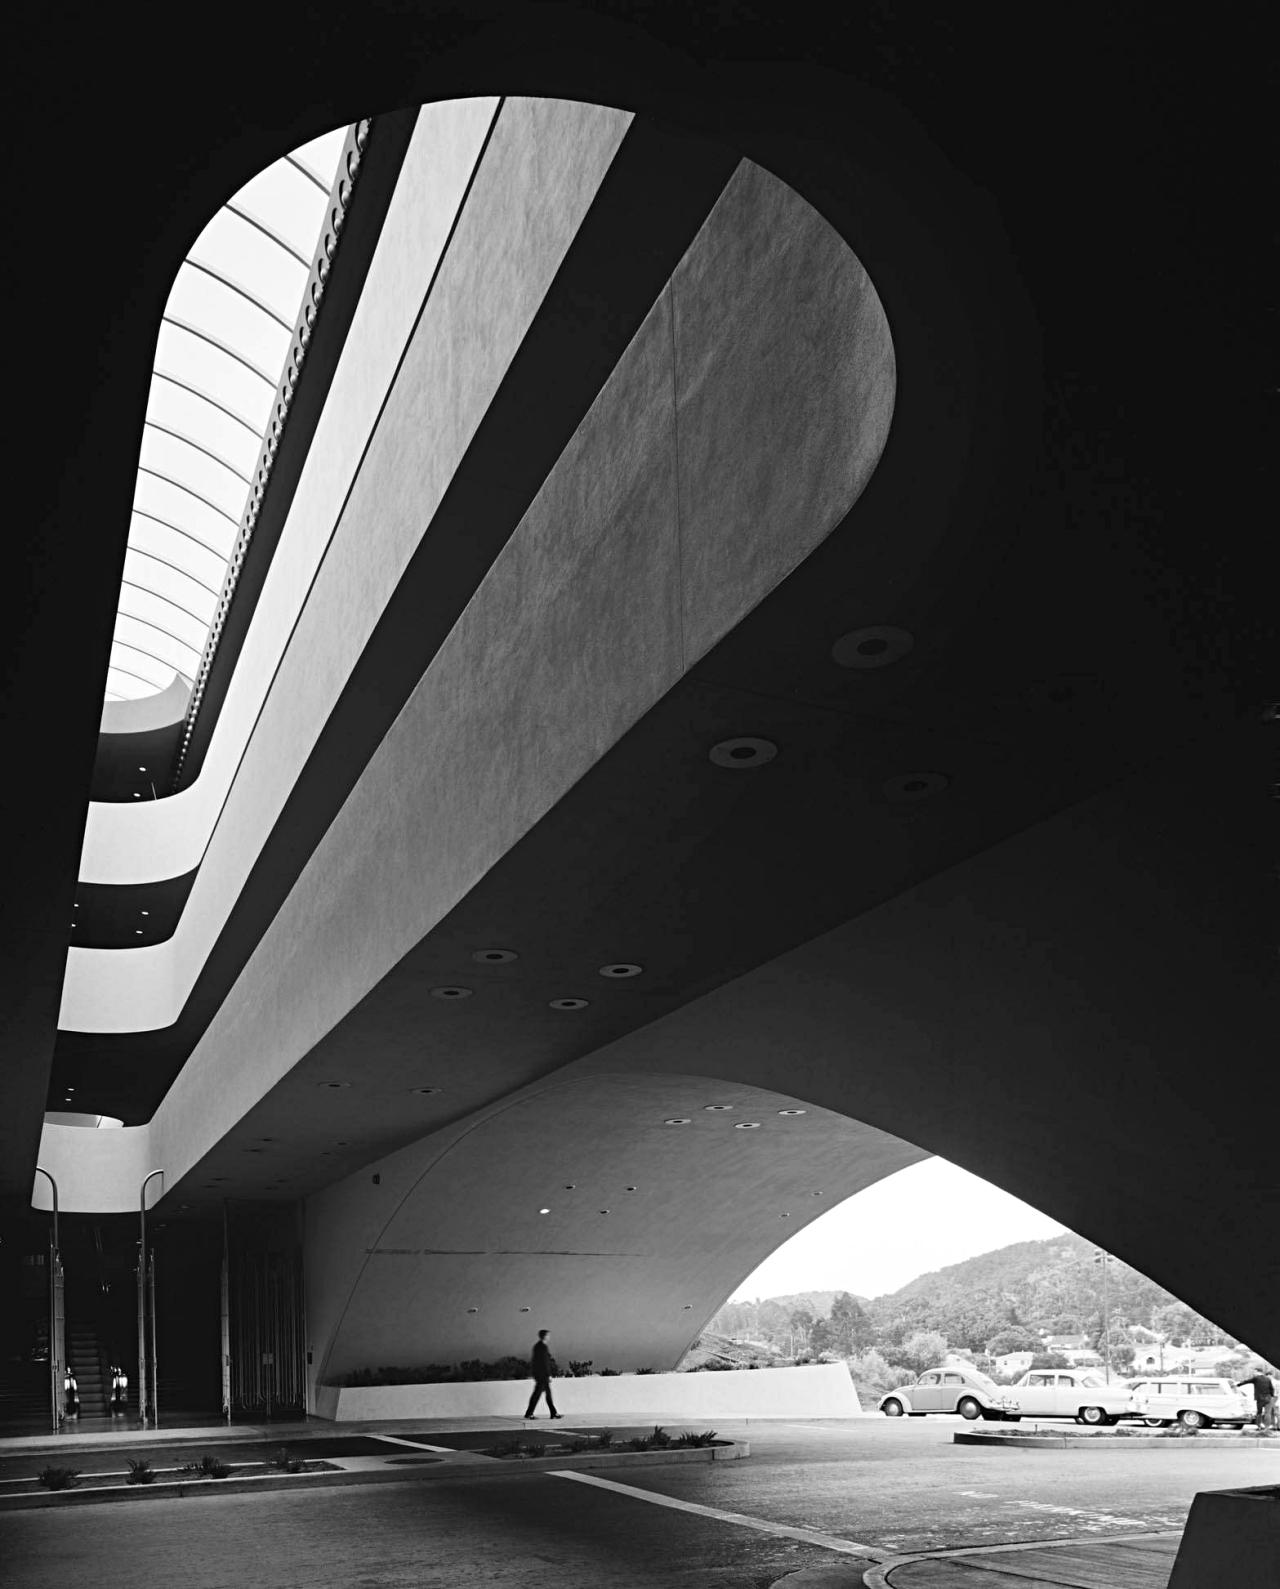 Ezra Stoller: The Marin County Civic Center in San Rafael, California. Designed by Frank Lloyd Wright. 1960